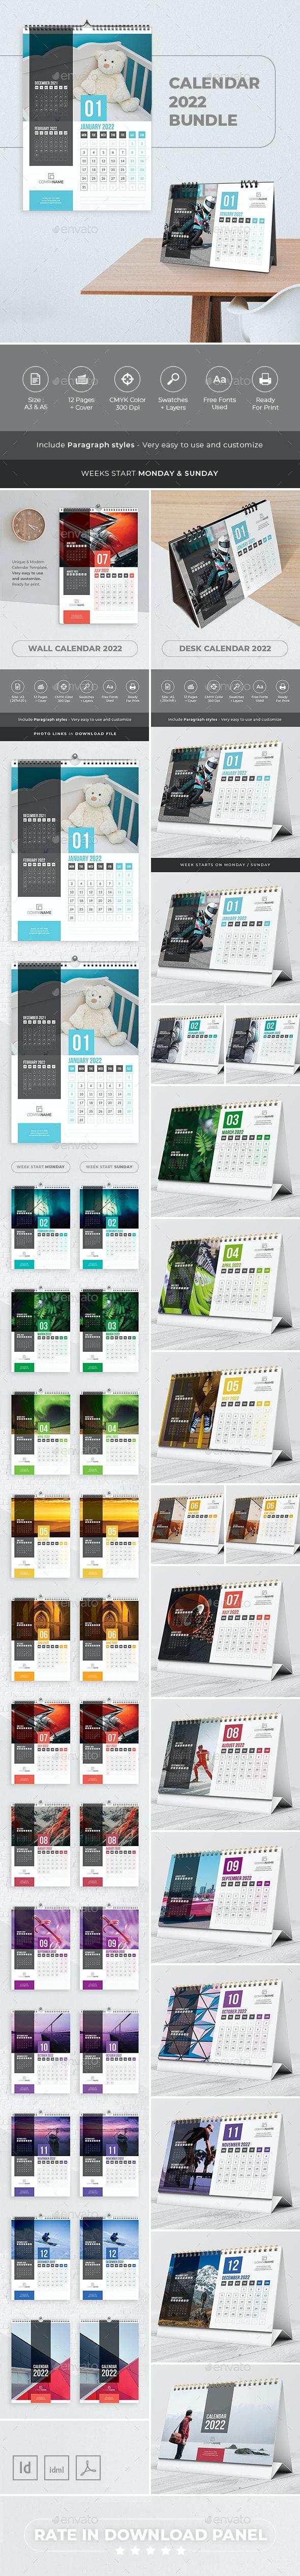 Calendar 2022 Bundle V05 - Calendars Stationery